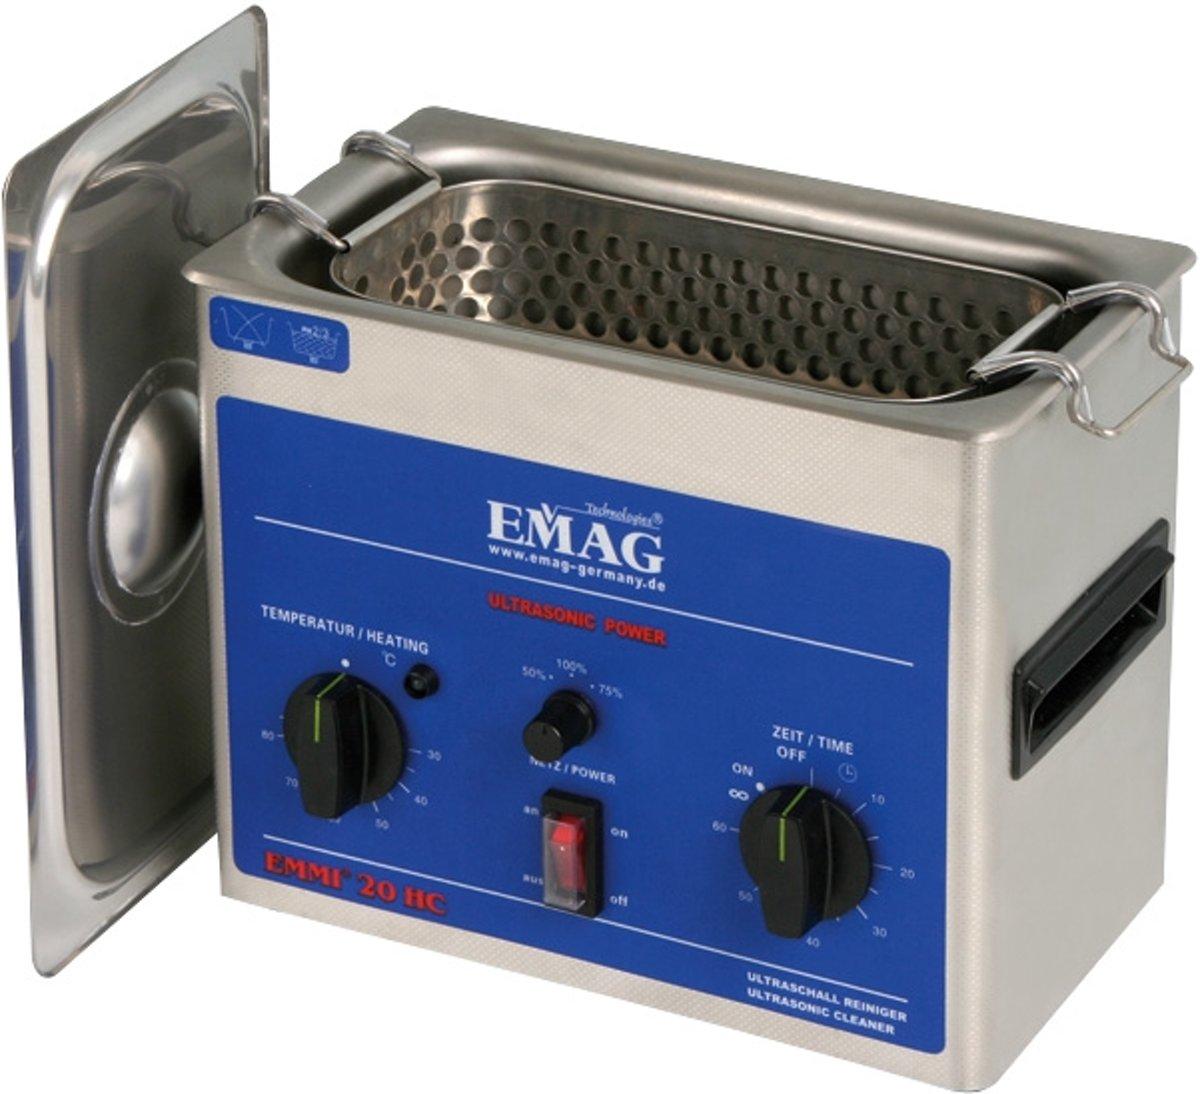 Emag Emmi 20HC - 2 liter ultrasoon Reiniger kopen